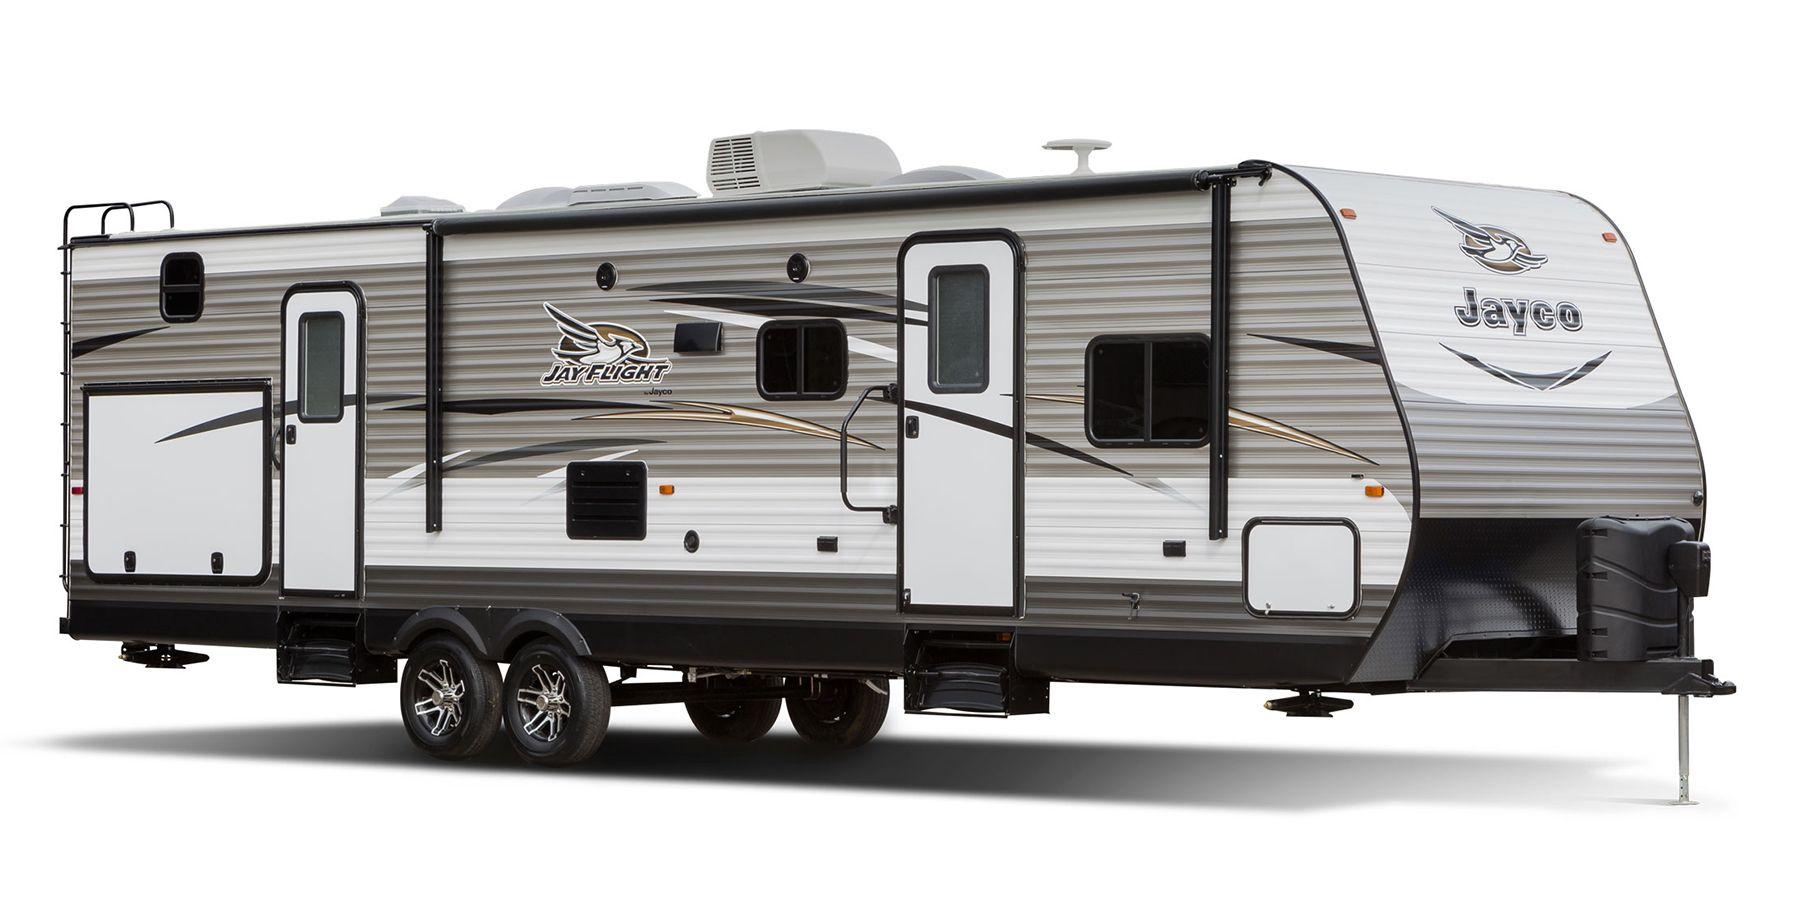 le guide officiel camping caravaning 2017